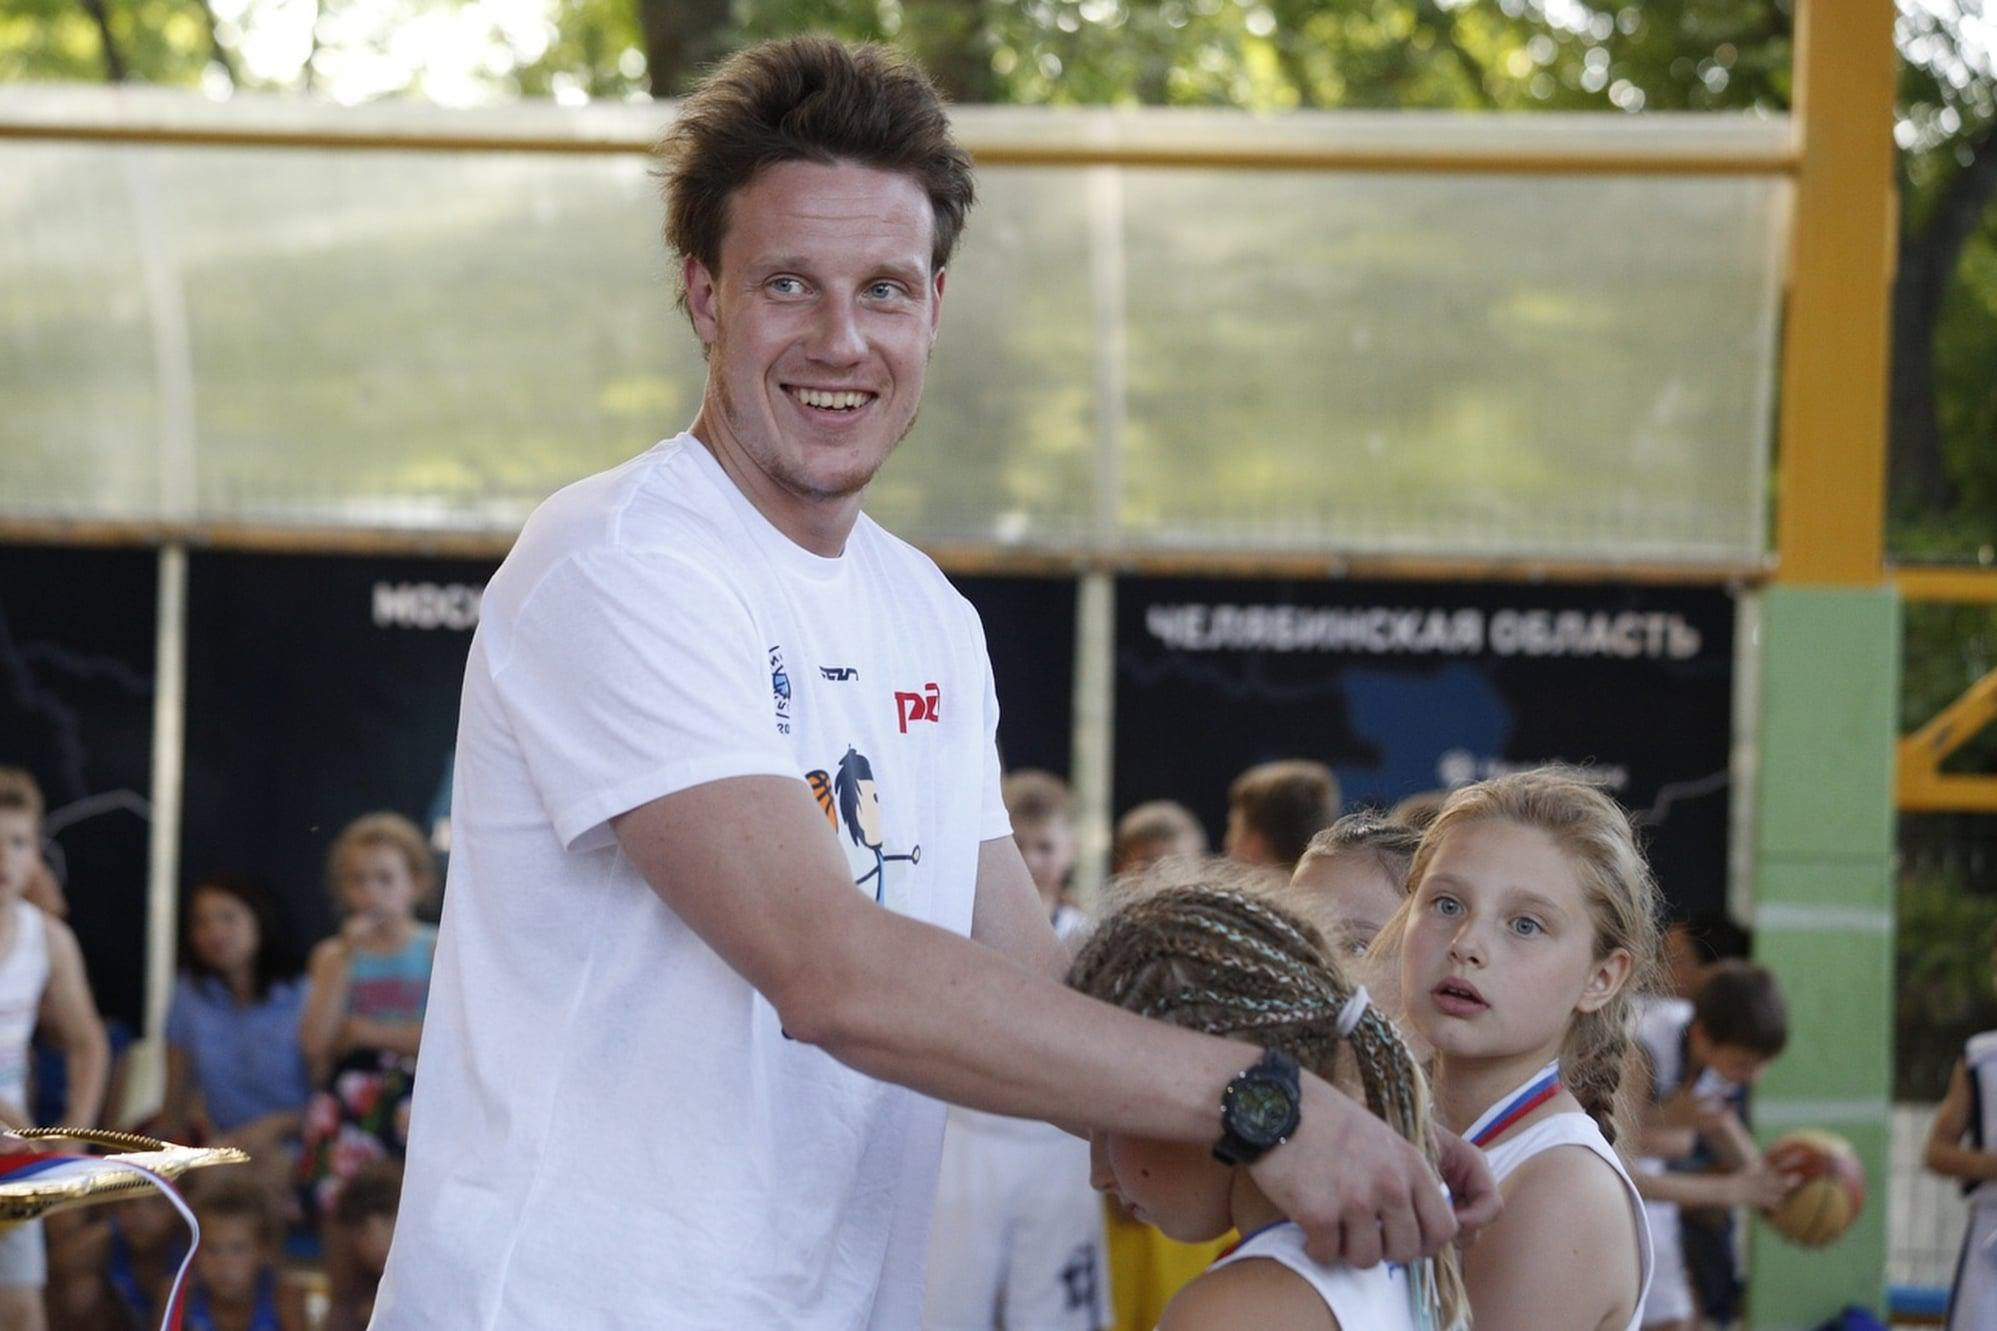 Дмитрий Кулагин стал гостем фестиваля «Мини-баскетбол РФБ»